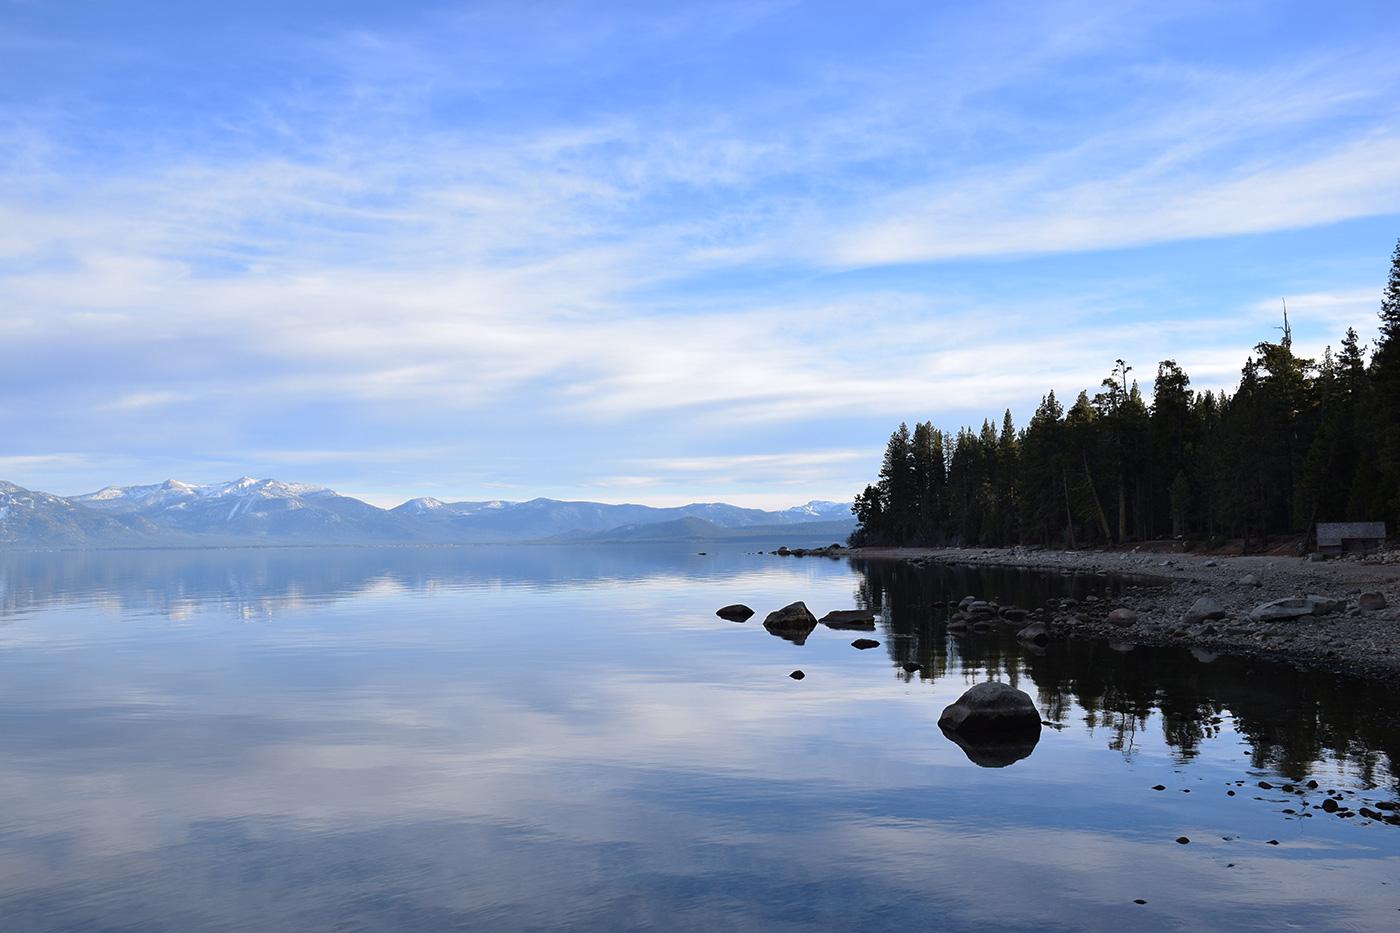 lake-tahoe-sugar-pine-point-hike-treeline-shore.jpg